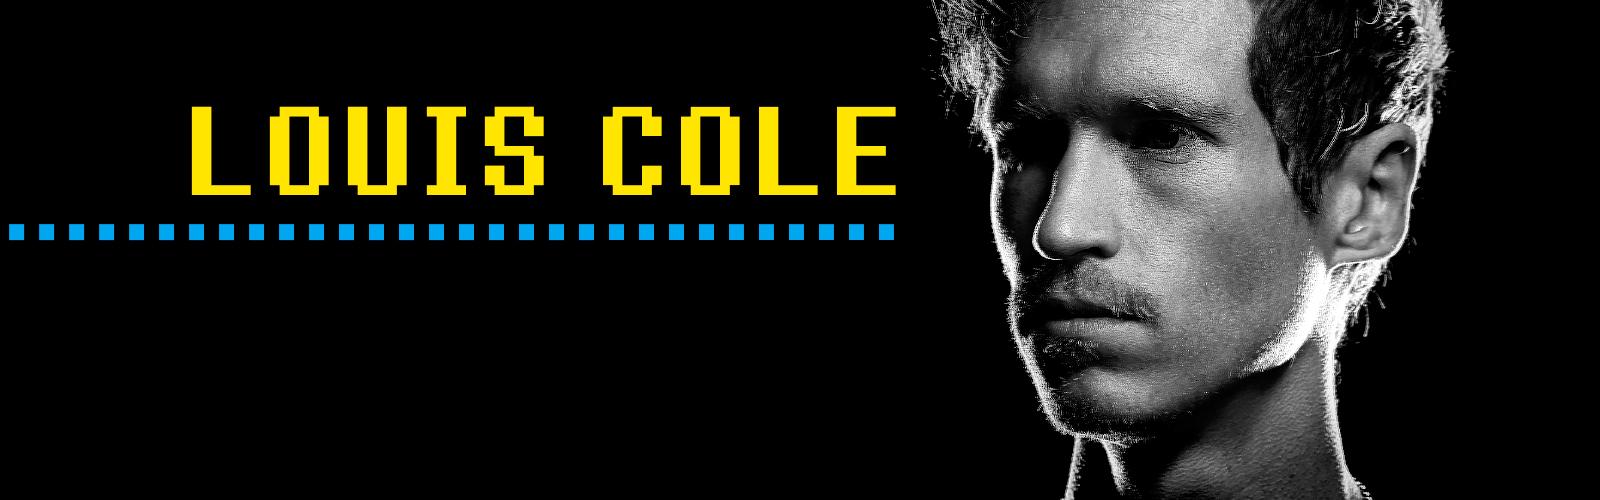 Louis Cole - Louis Cole Lyrics and Tracklist | Genius